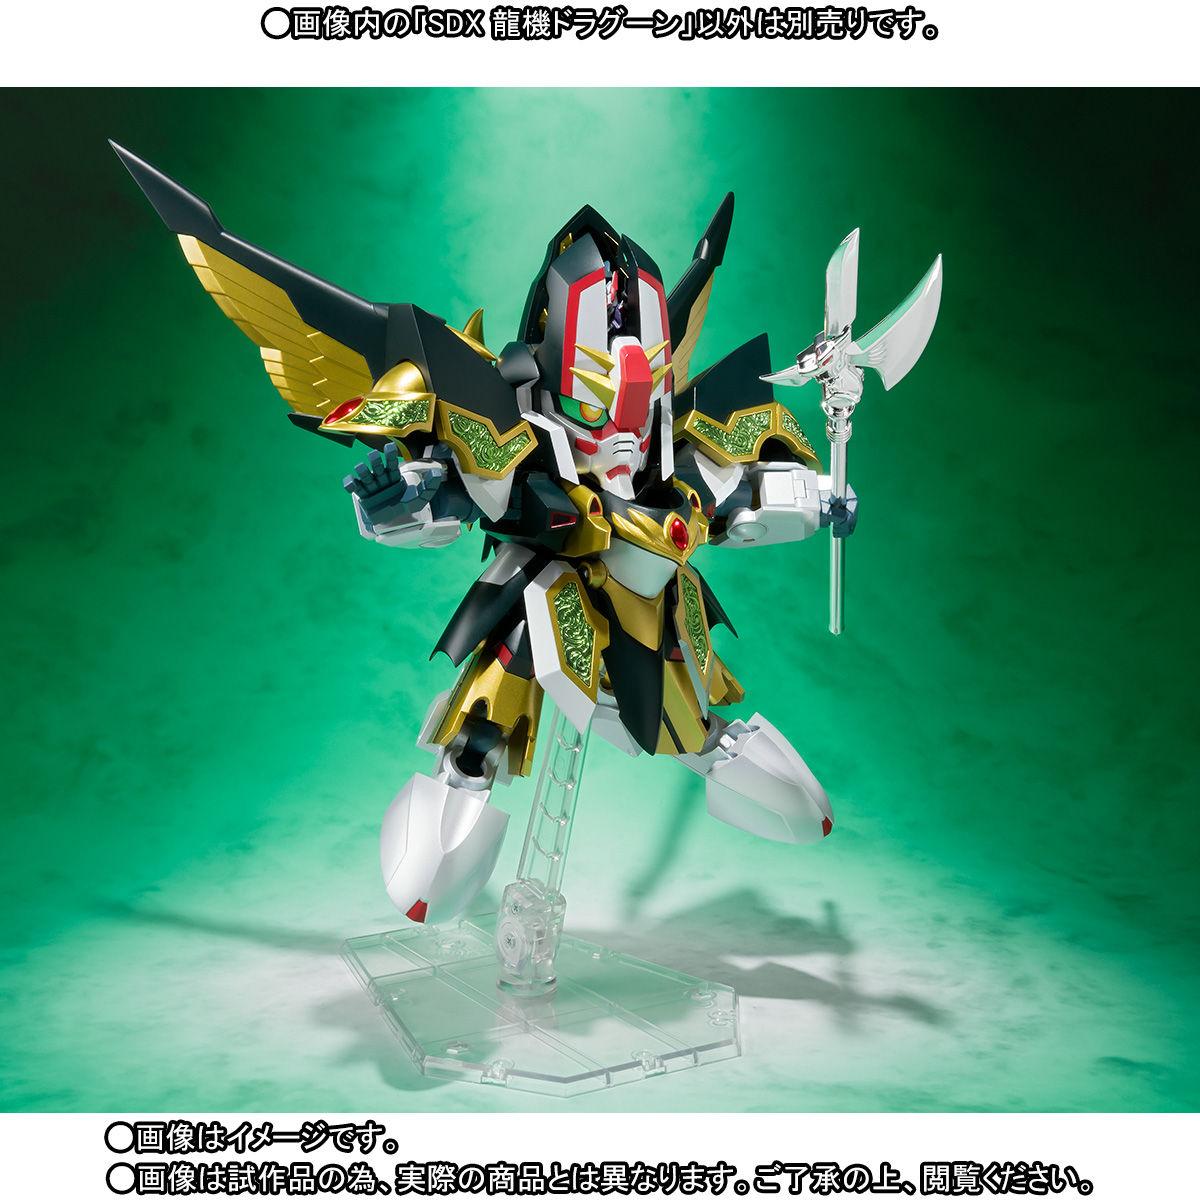 SDX『龍機ドラグーン|新SDガンダム外伝』可変可動フィギュア-003